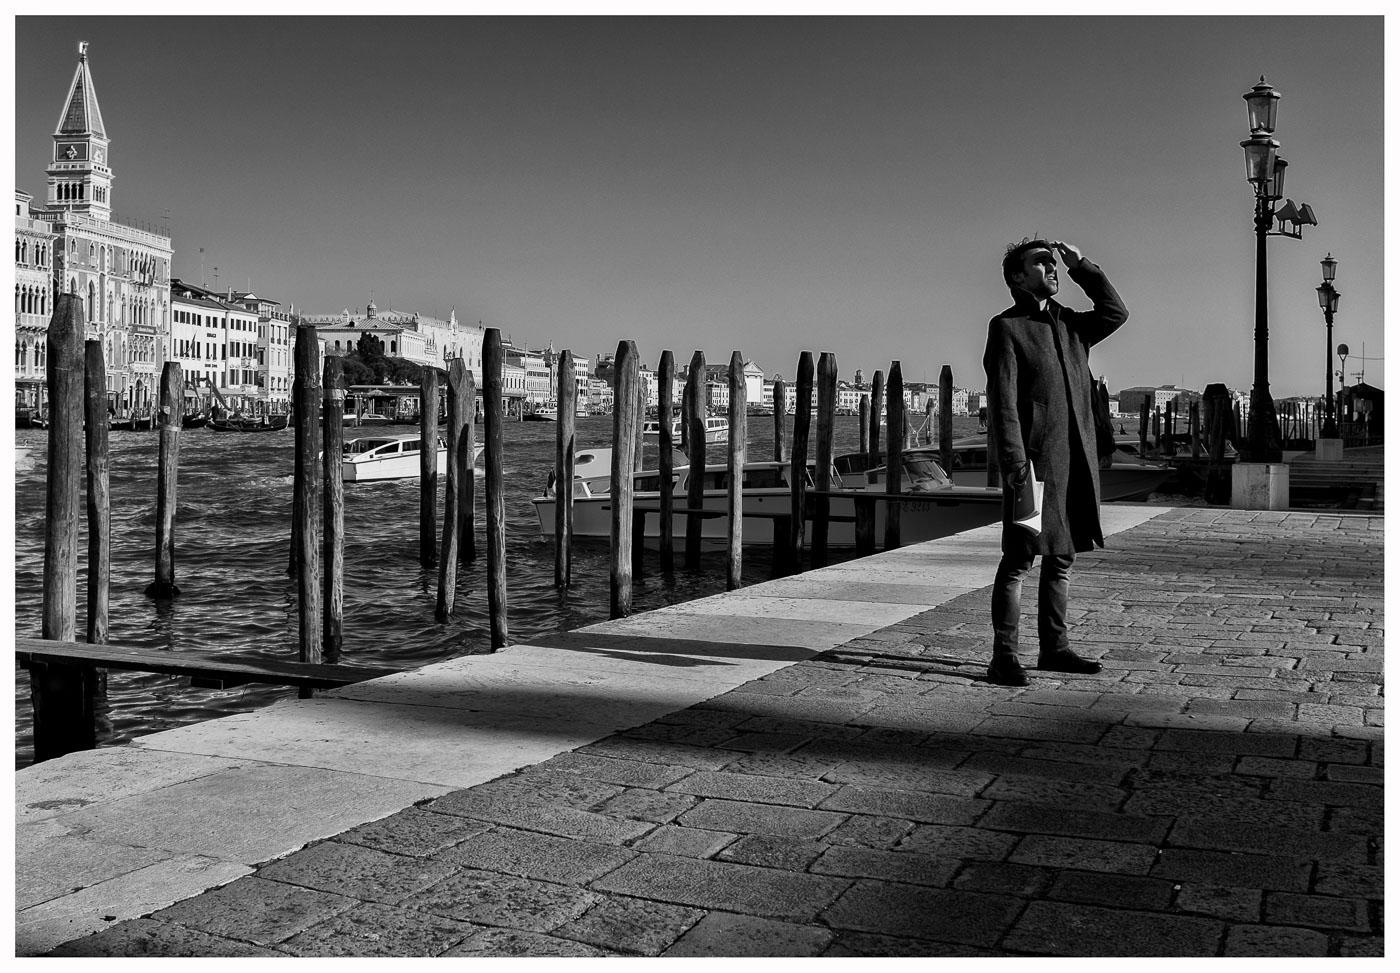 Venice January 2015